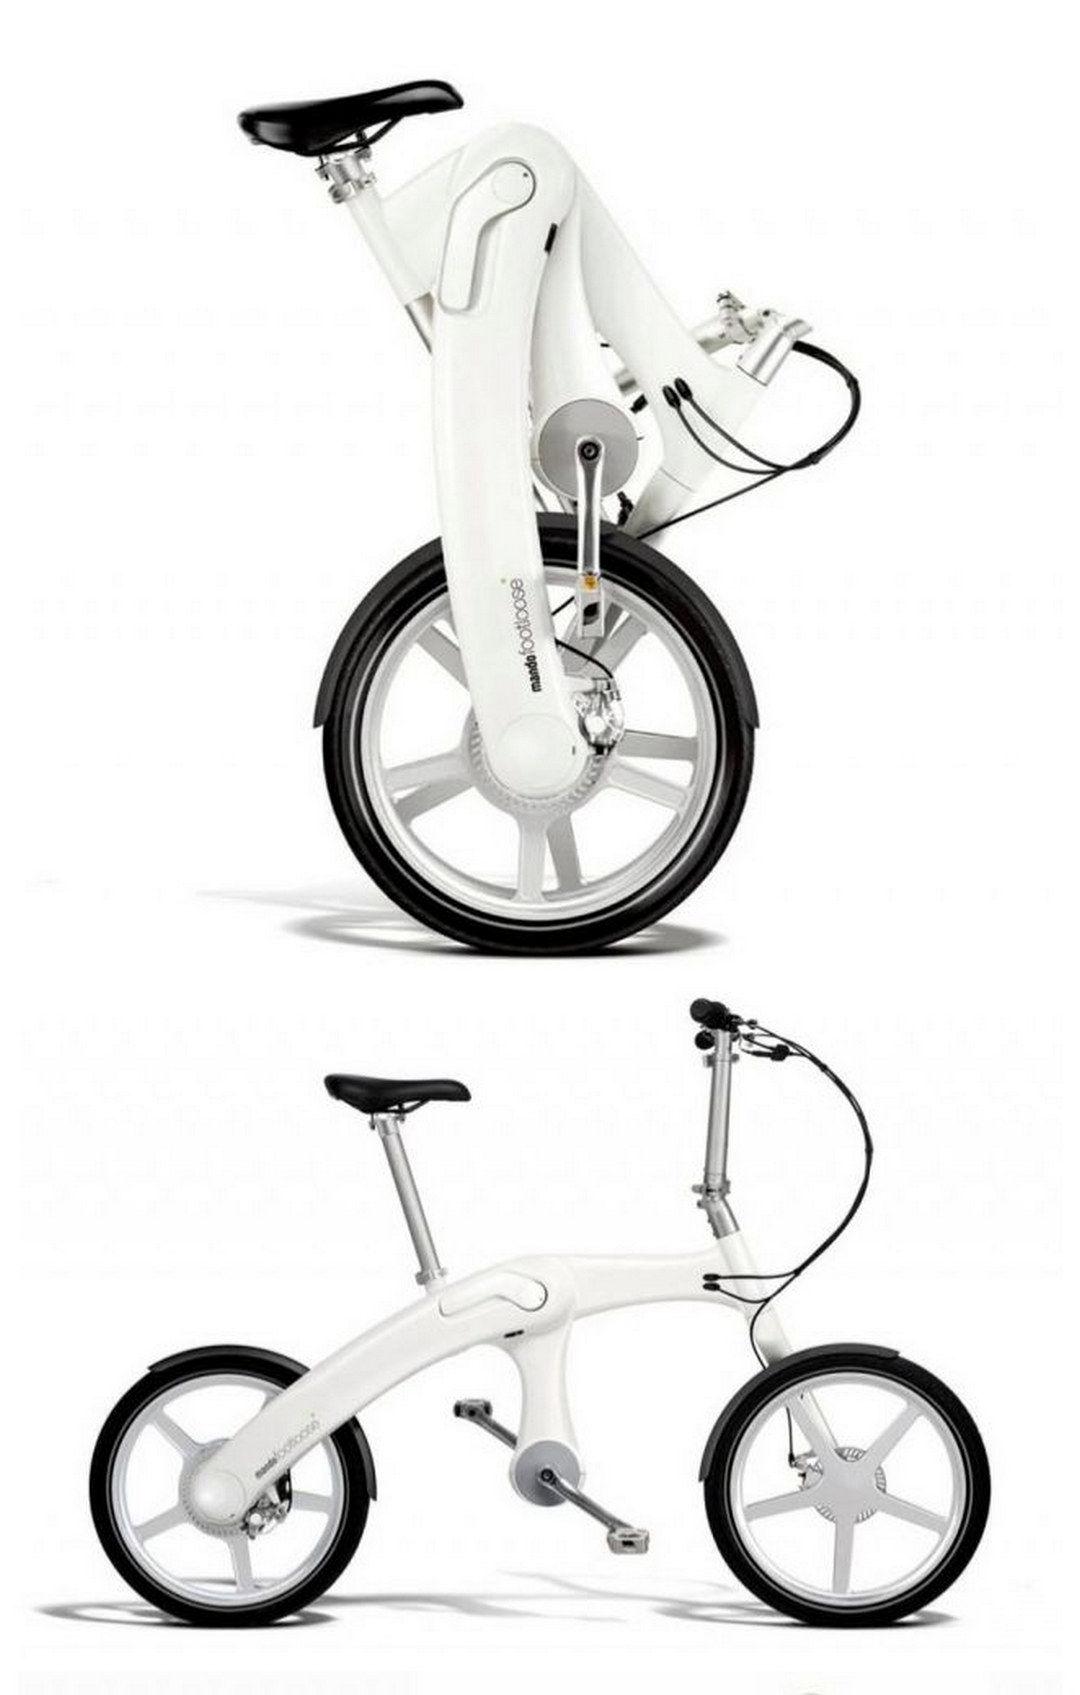 91 Incredible Futuristic Bicycle Designs